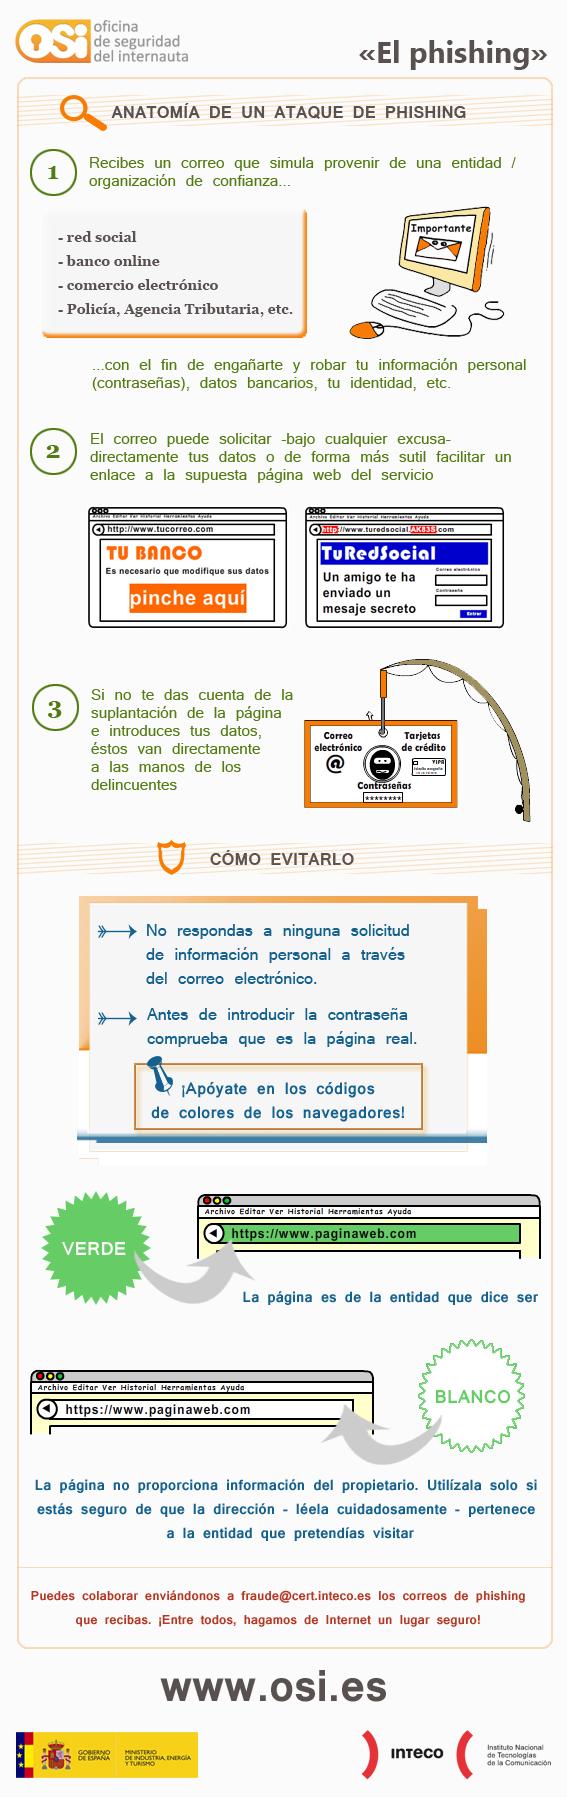 Anatomía de un ataque de Phishing   Uso responsable redes sociales ...